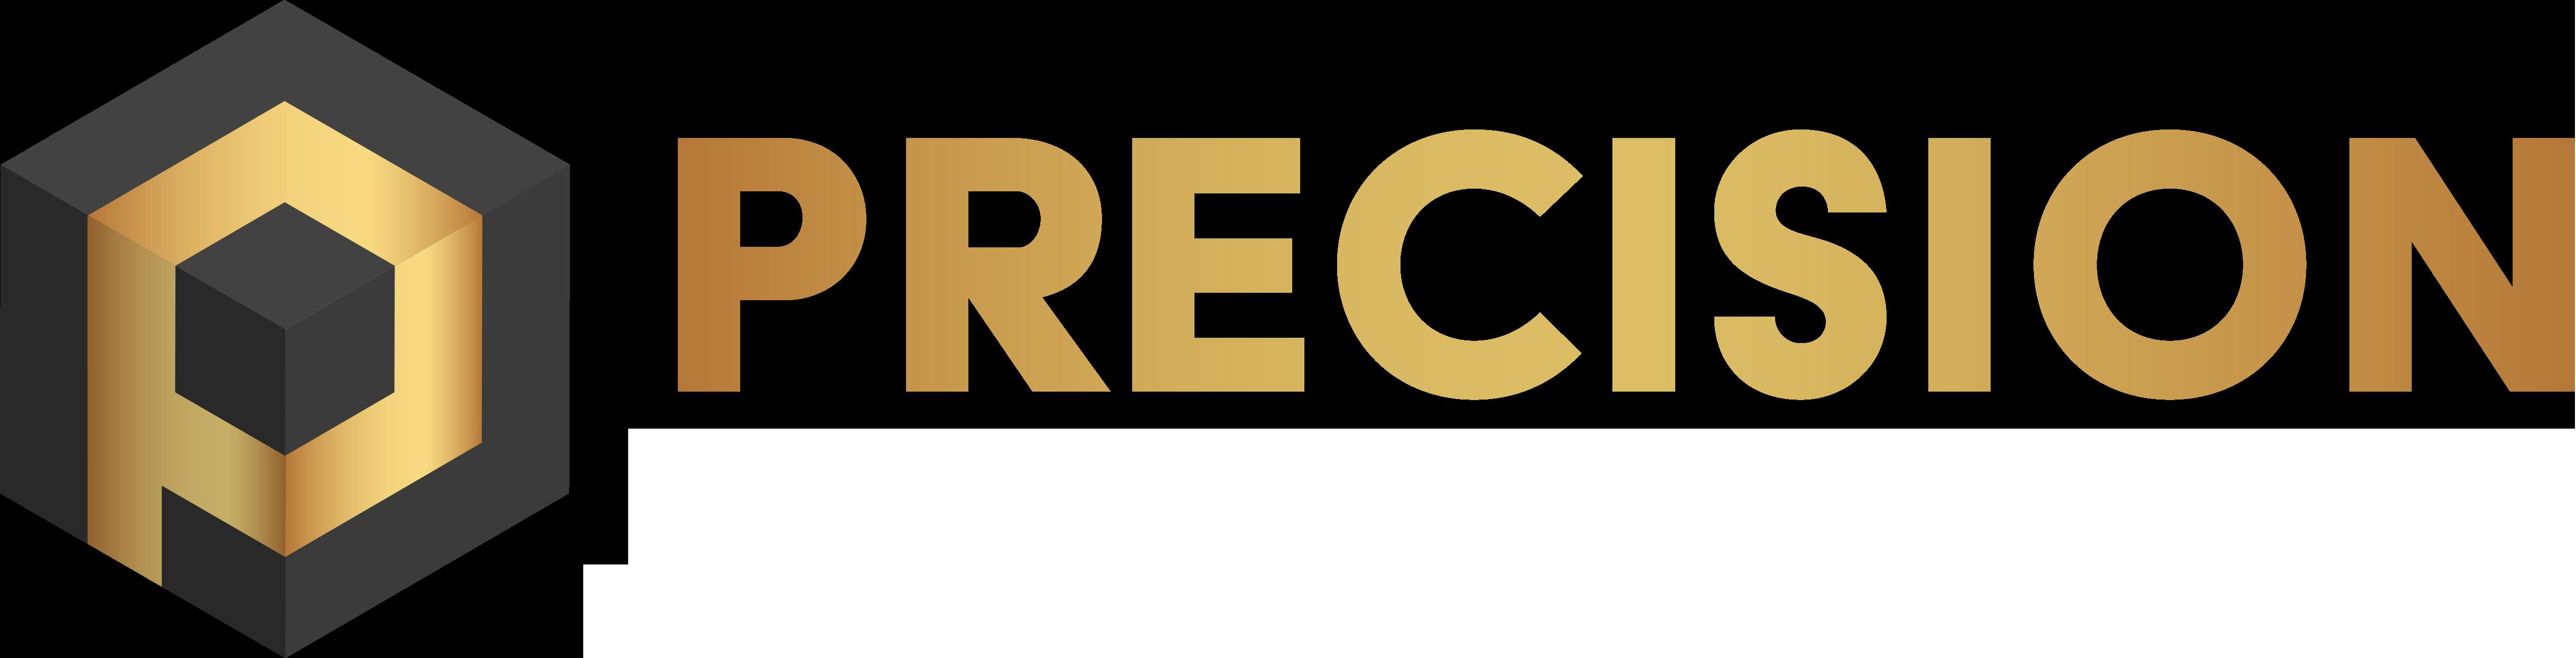 San Diego General Contractors Home Design Contractor San Diego Construction Company Precision Sd